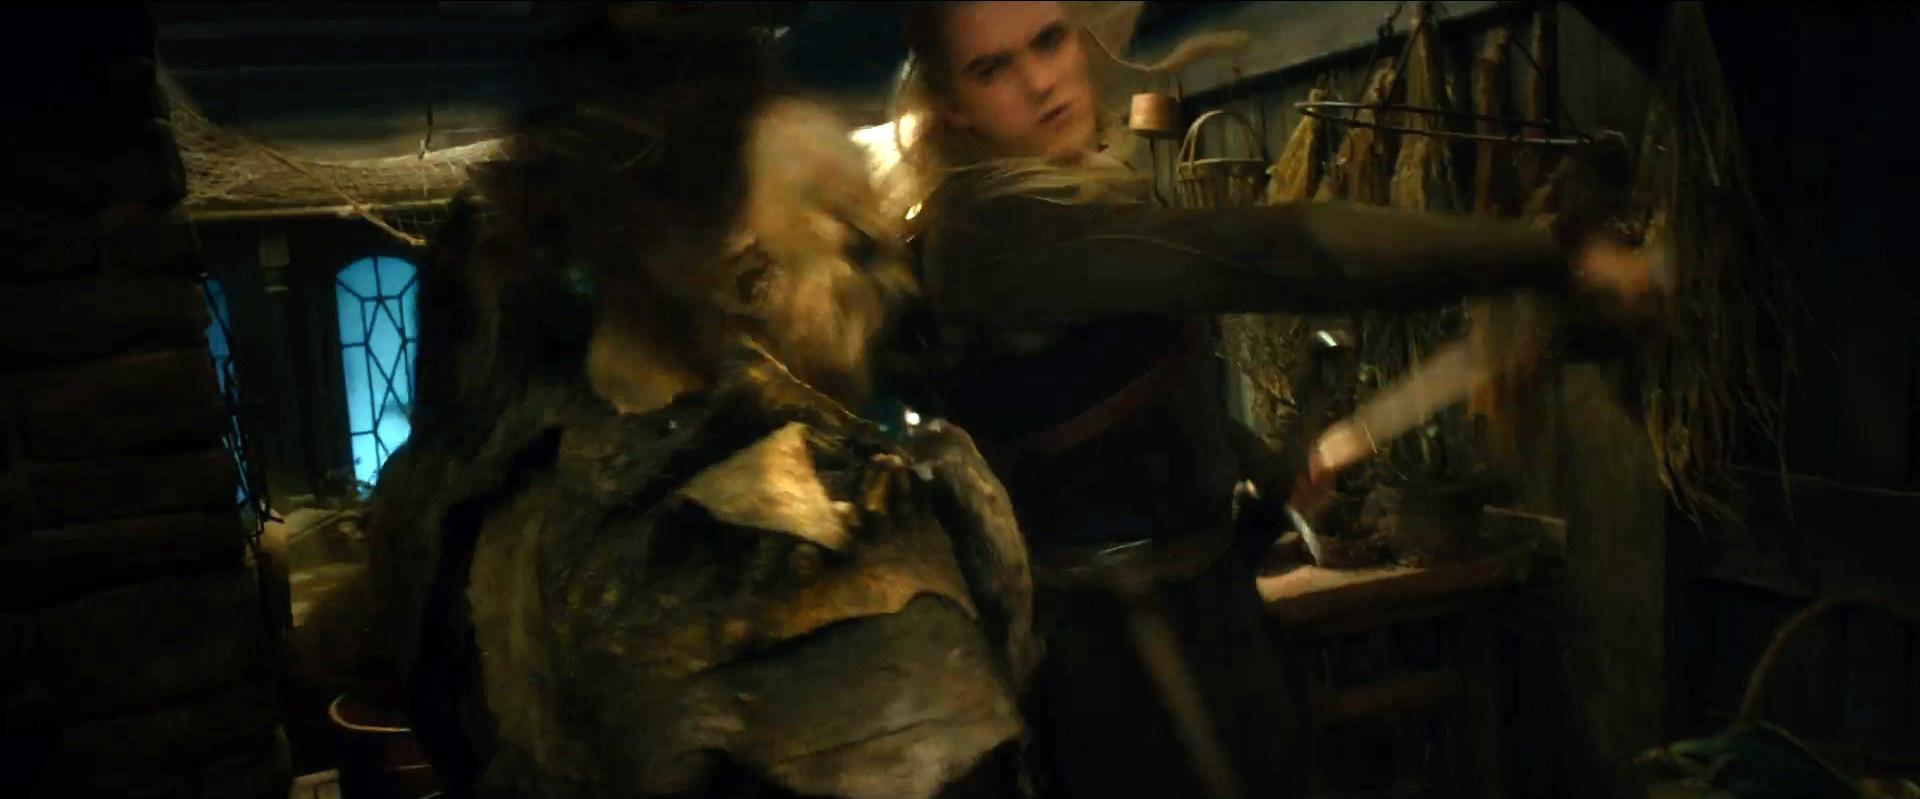 The Hobbit Trailer Analysis - The Desolation of Smaug | Hobbit Movie News and Rumors | TheOneRing.net™ - Part 4